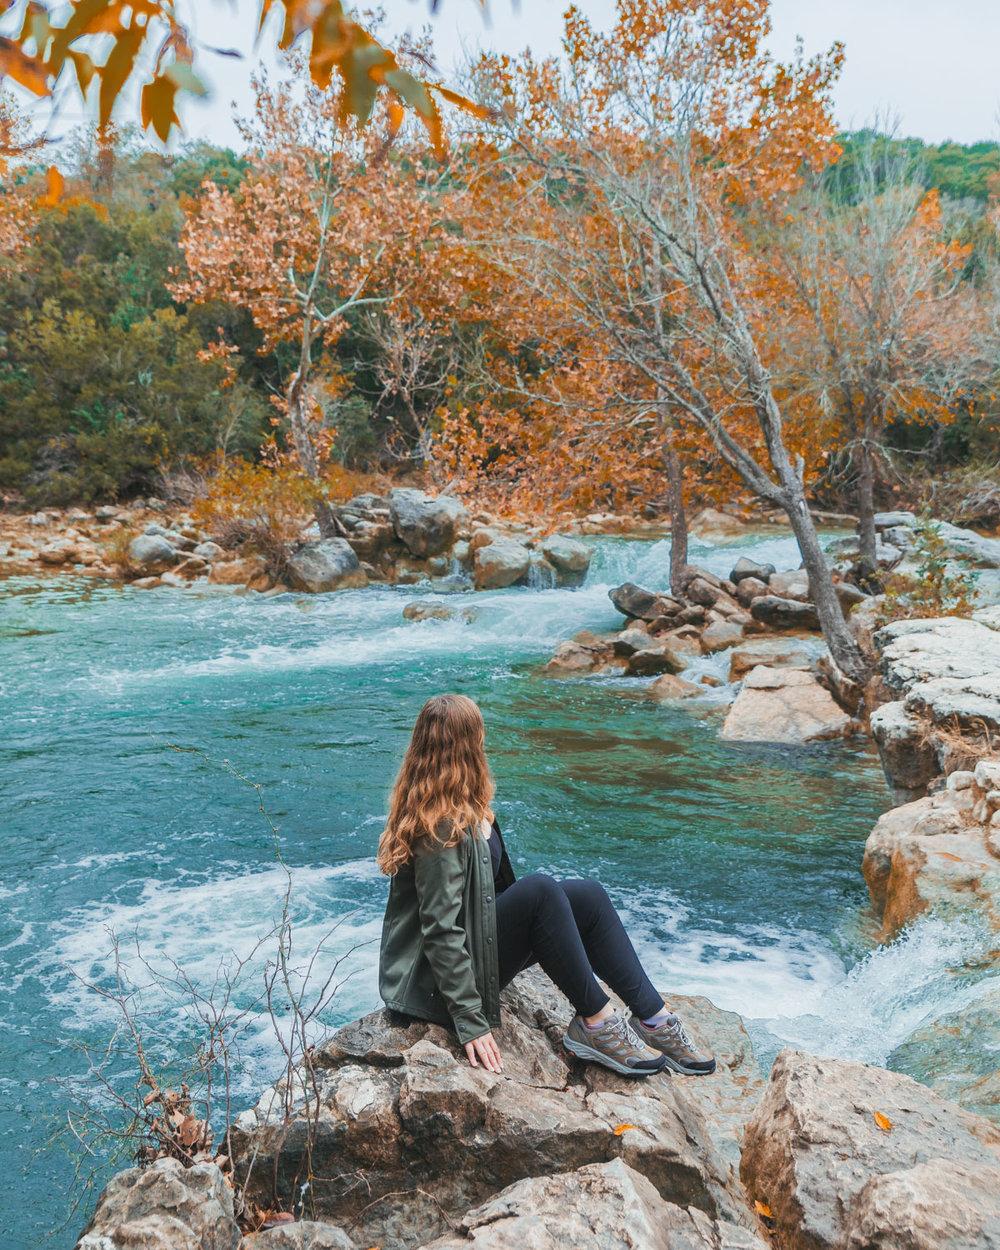 Barton Creek Greenbelt // 5 Austin Hiking Trails to Try This Fall #readysetjetset #outdoors #hiking #blogtips #texas #atx